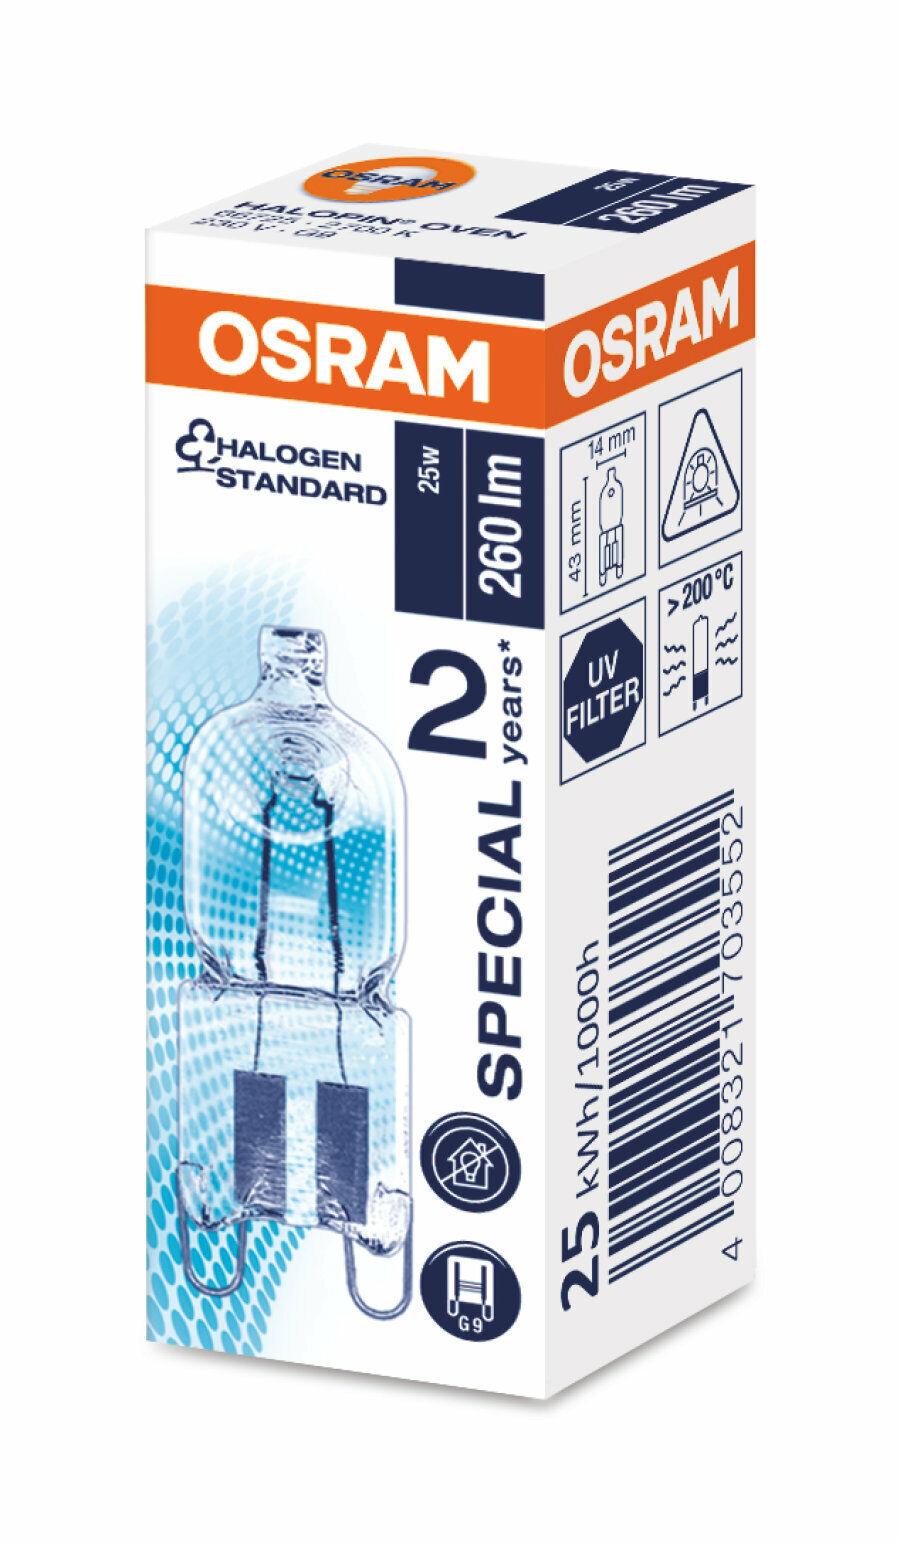 Osram 66725 Backofenlampe 25 Watt Halogenlampe Halopin Oven G9 230V 25W 260lm